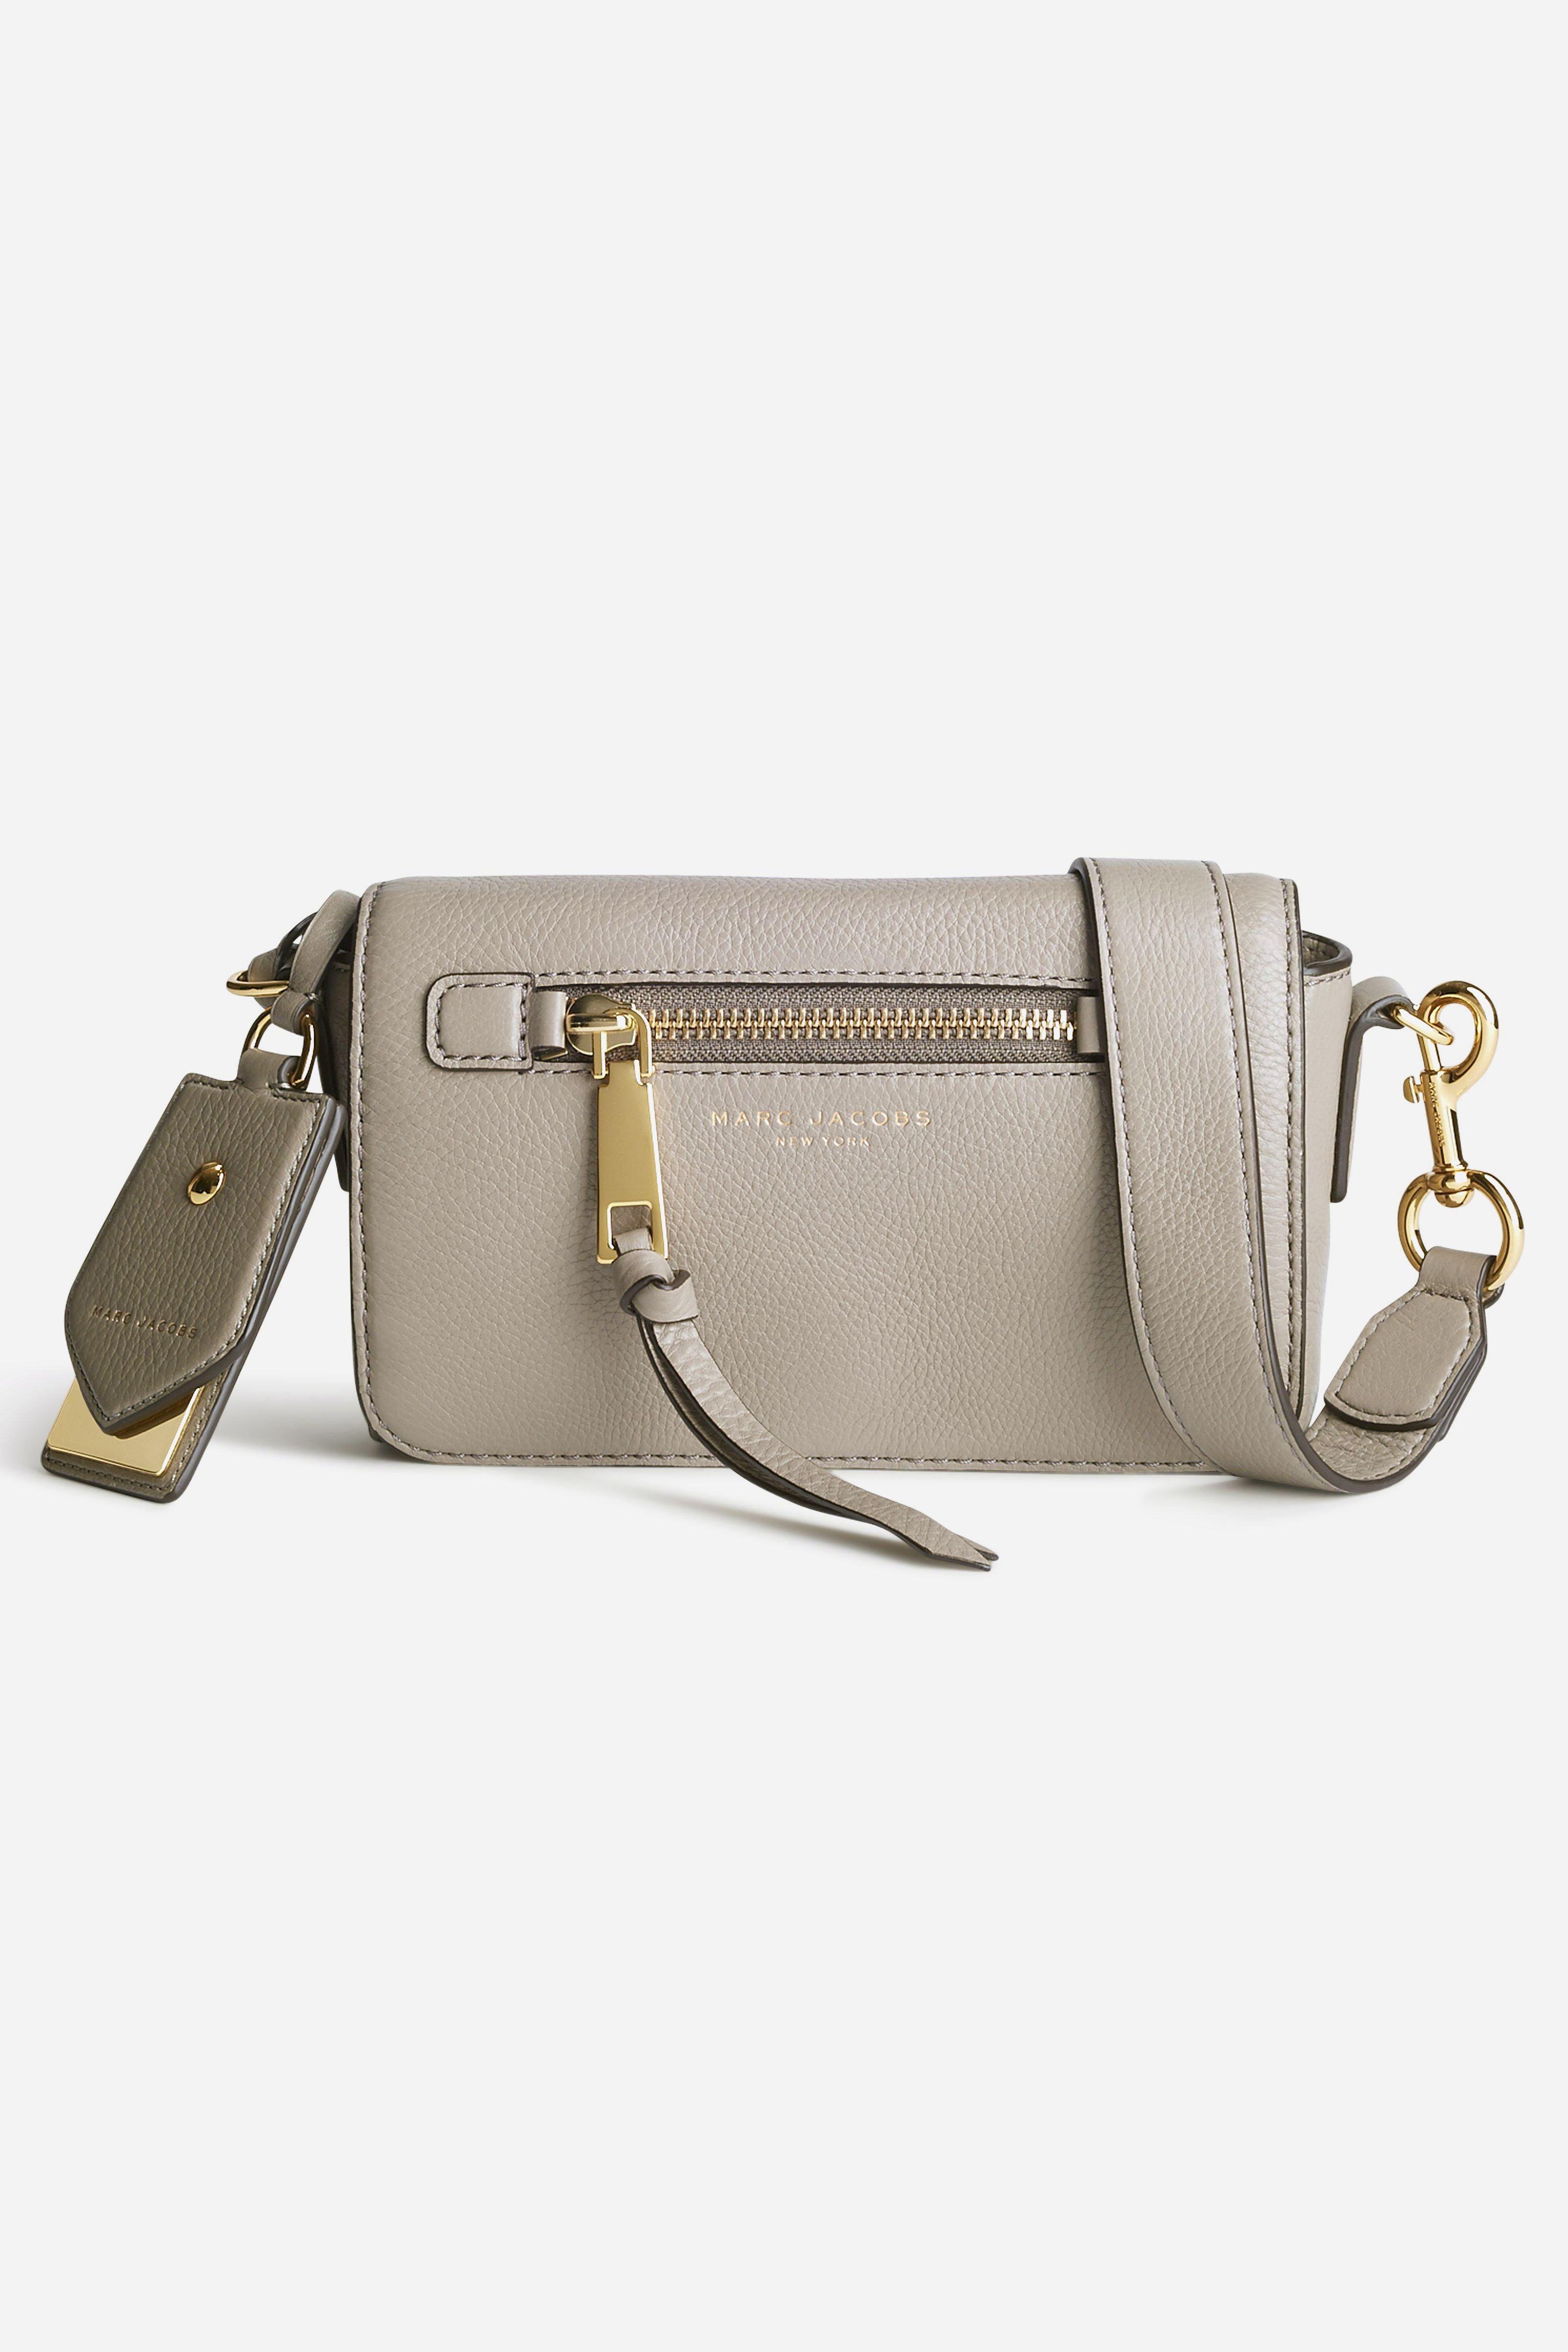 449d7ede2db6 Recruit Crossbody Bag - Mink